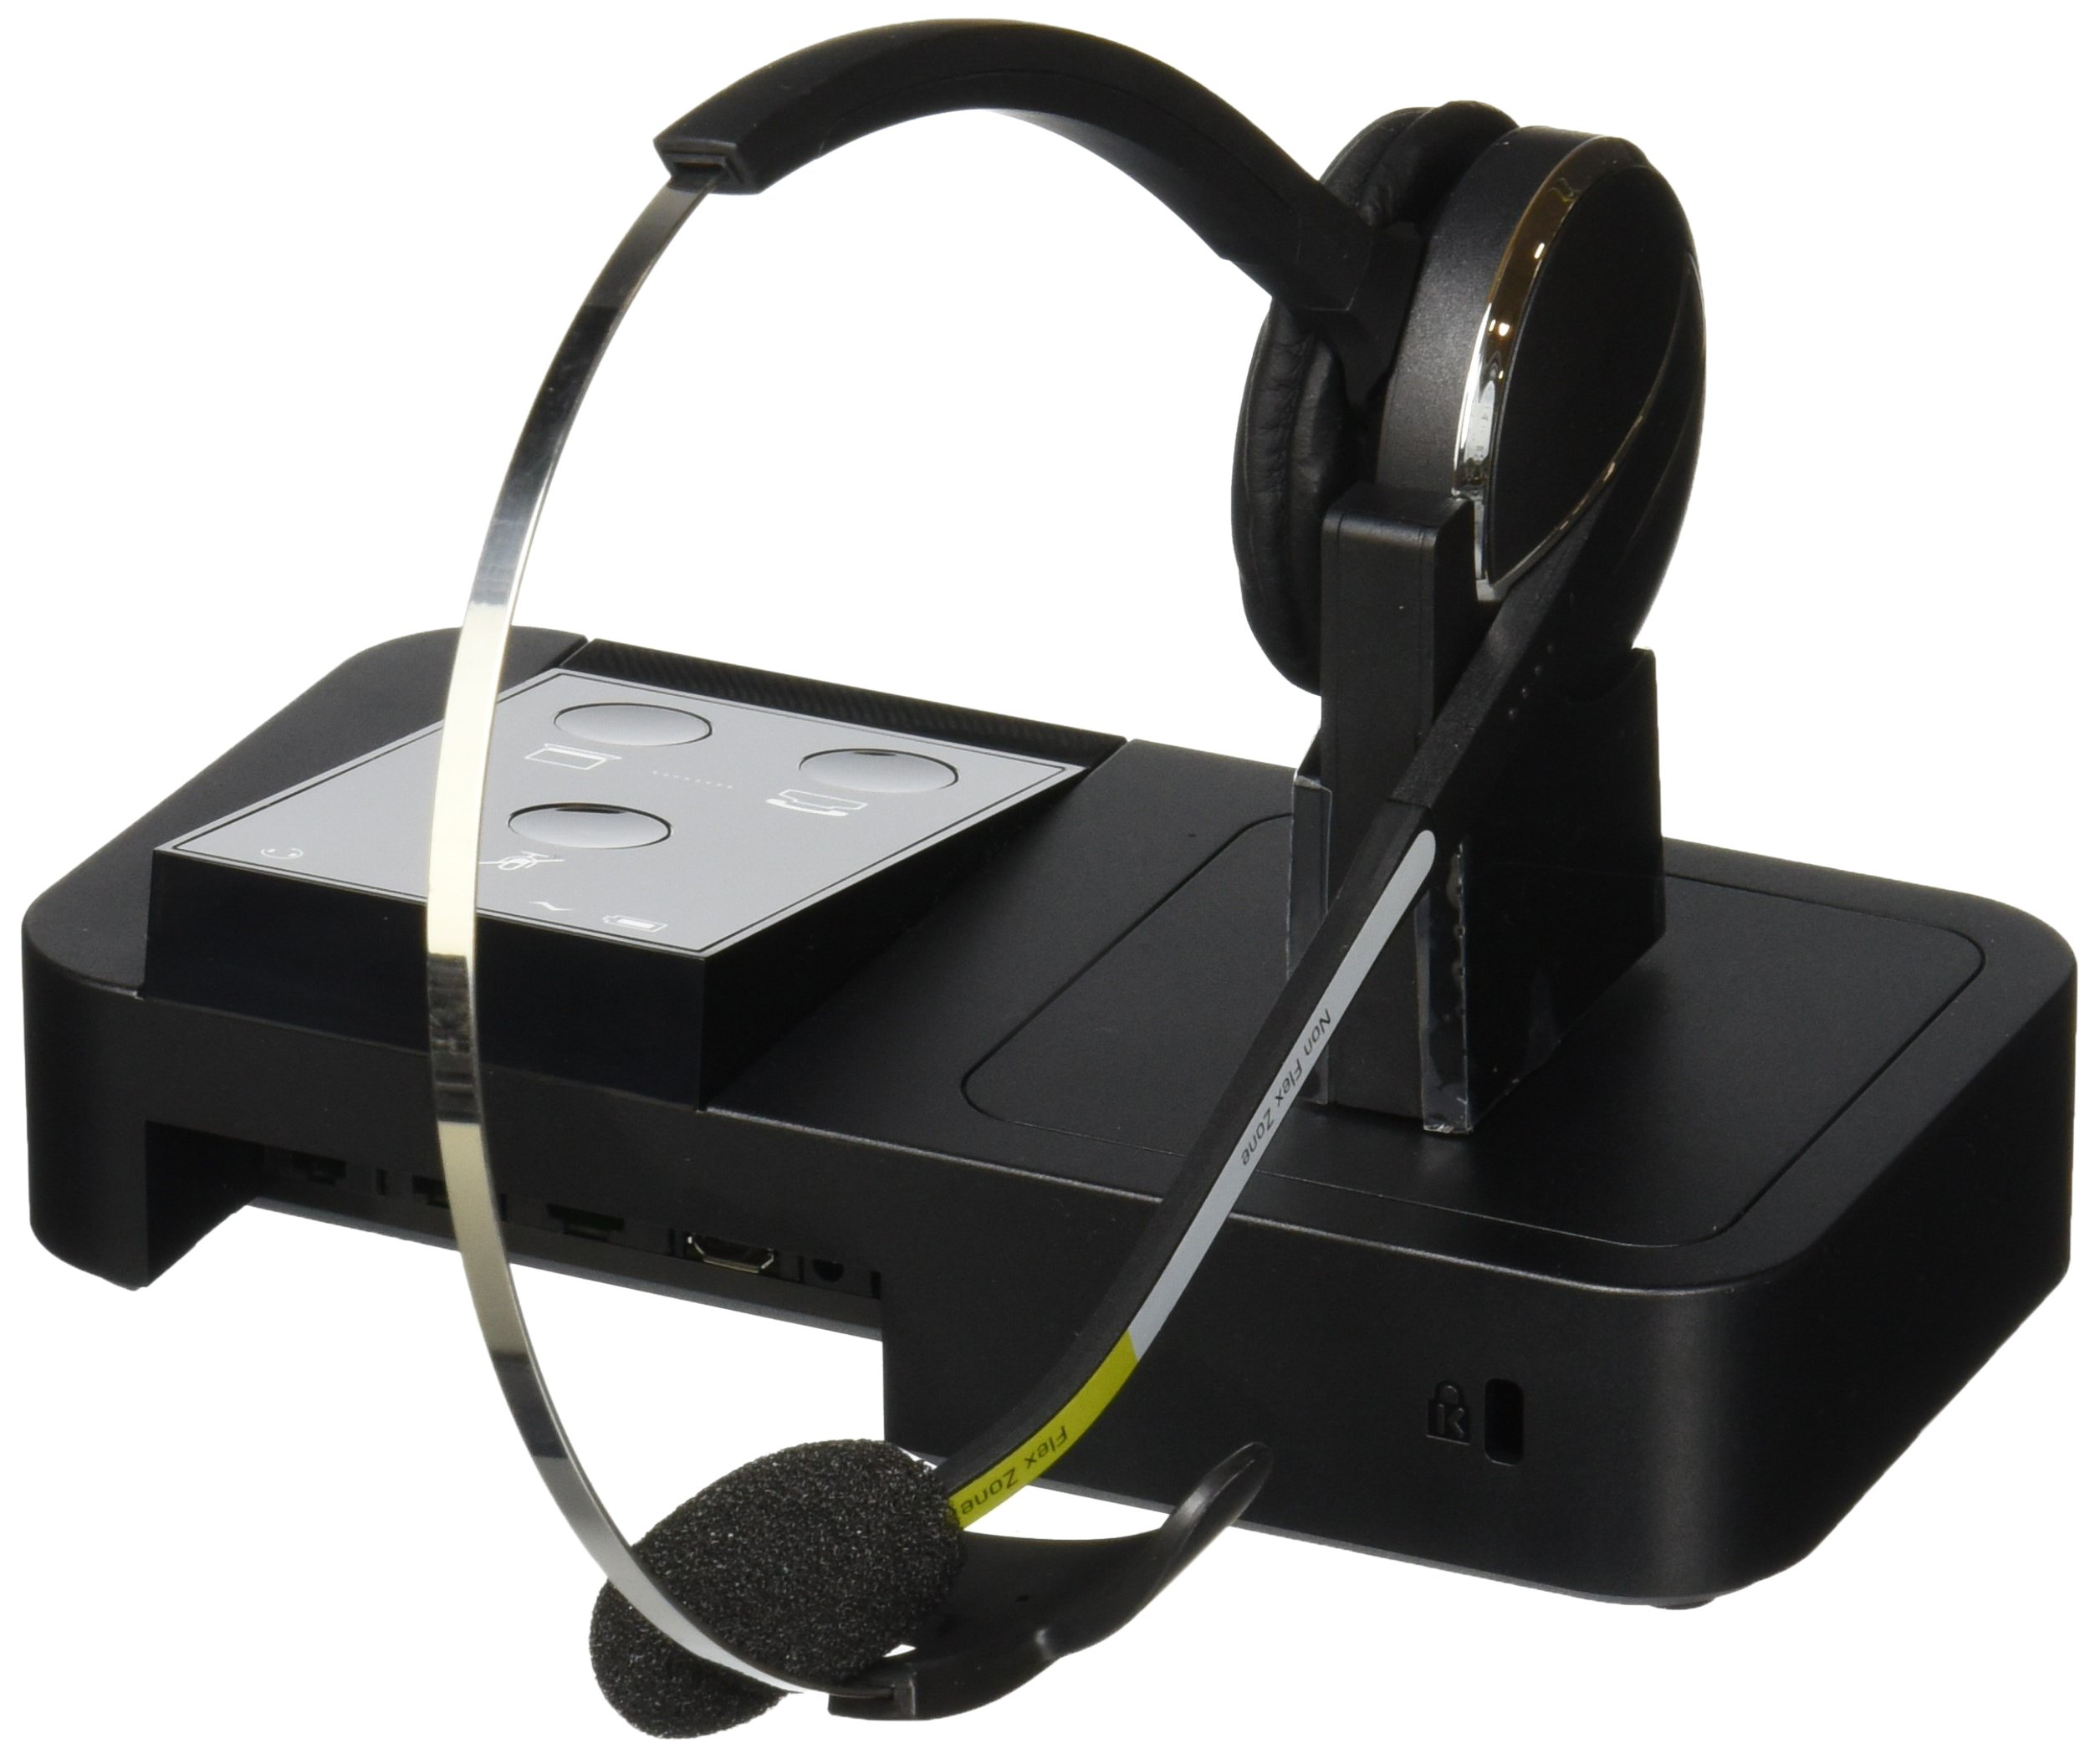 Jabra PRO 9450 Mono Flex-Boom Wireless Headset for Deskphone & Softphone by Jabra (Image #2)